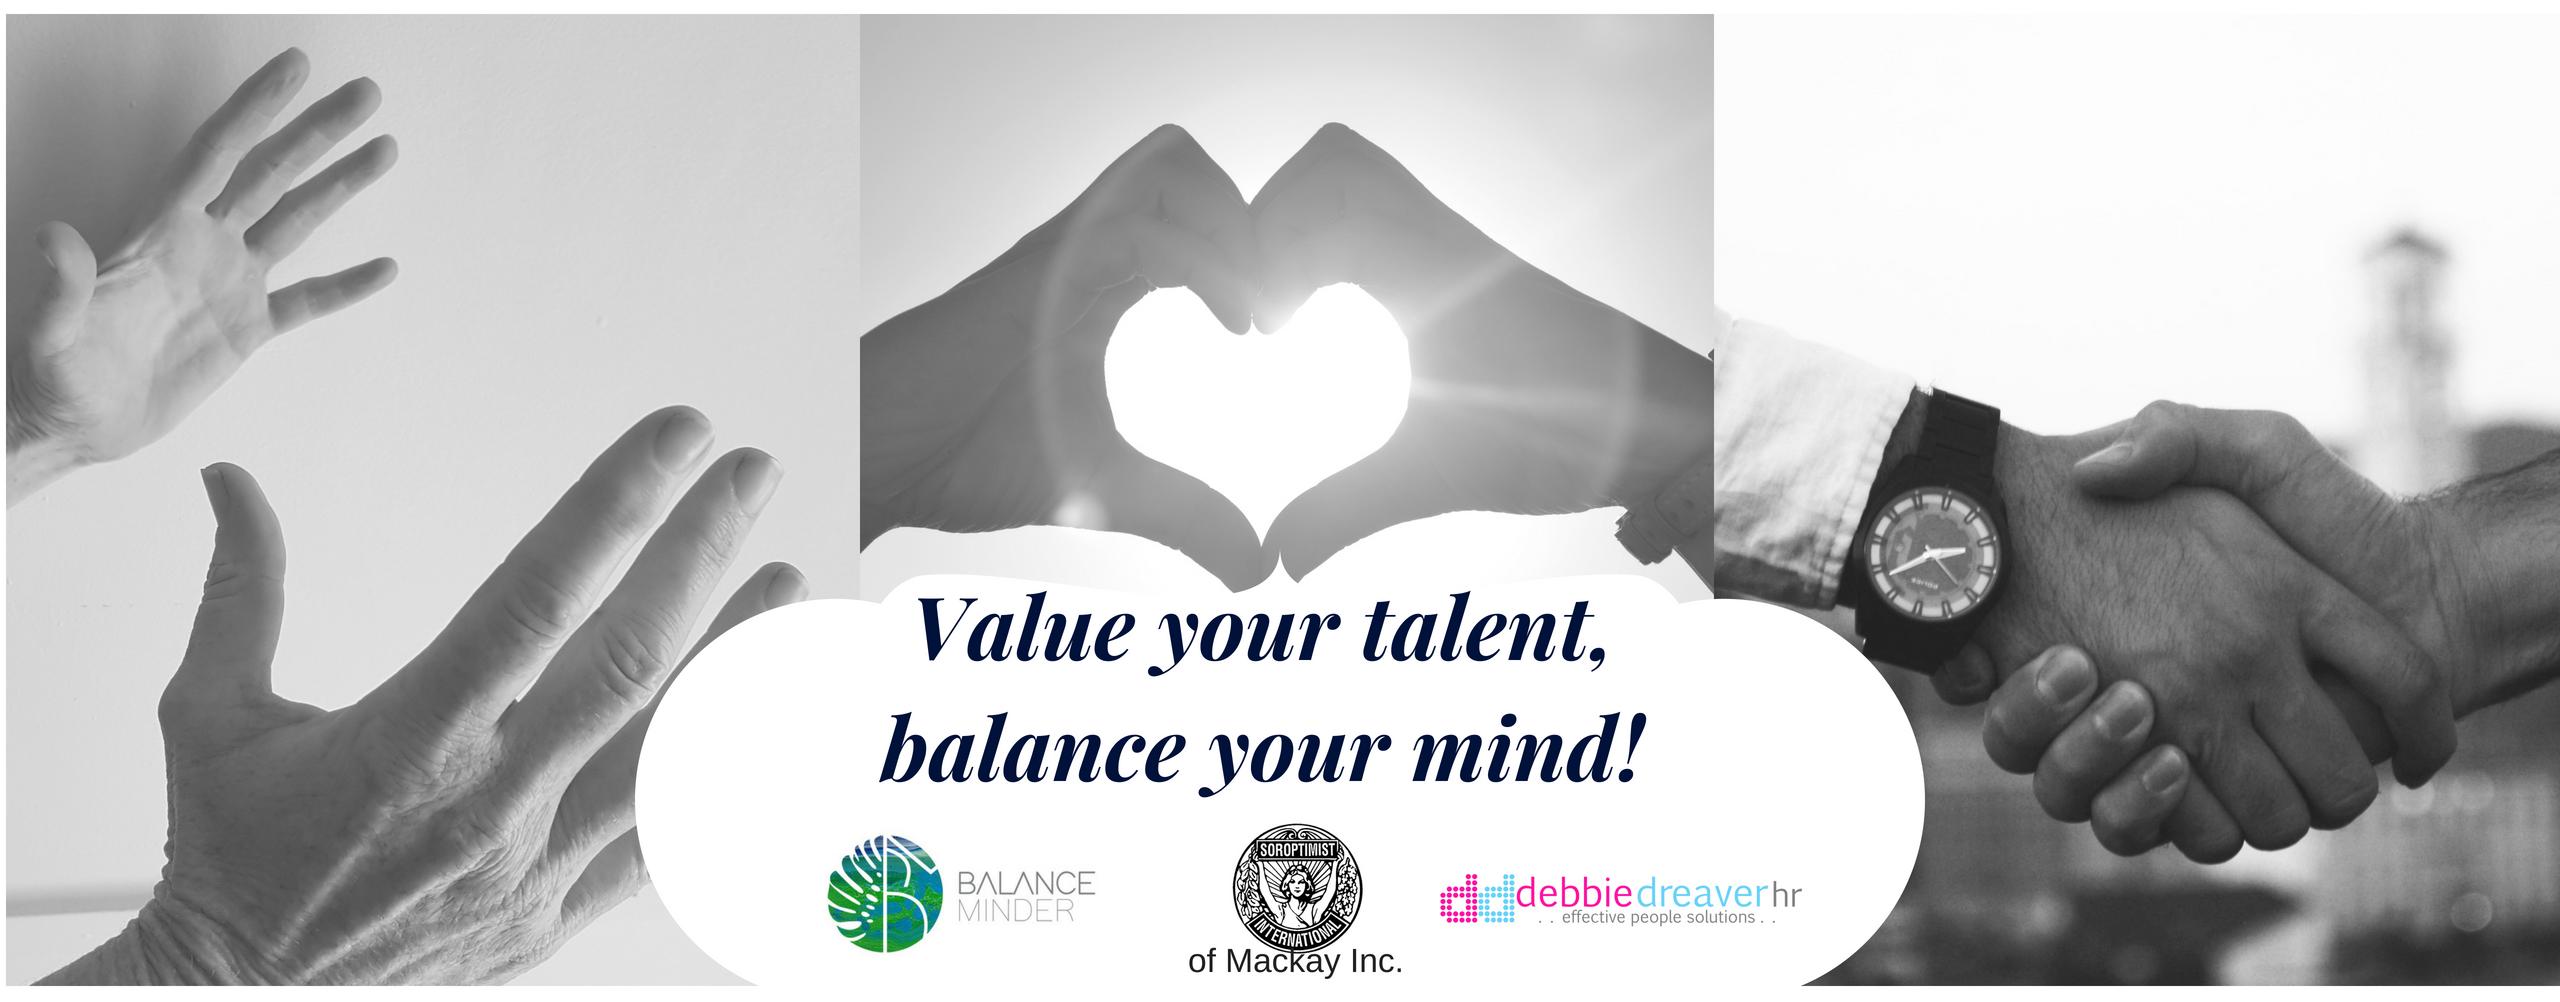 Value your talent, balance your mind